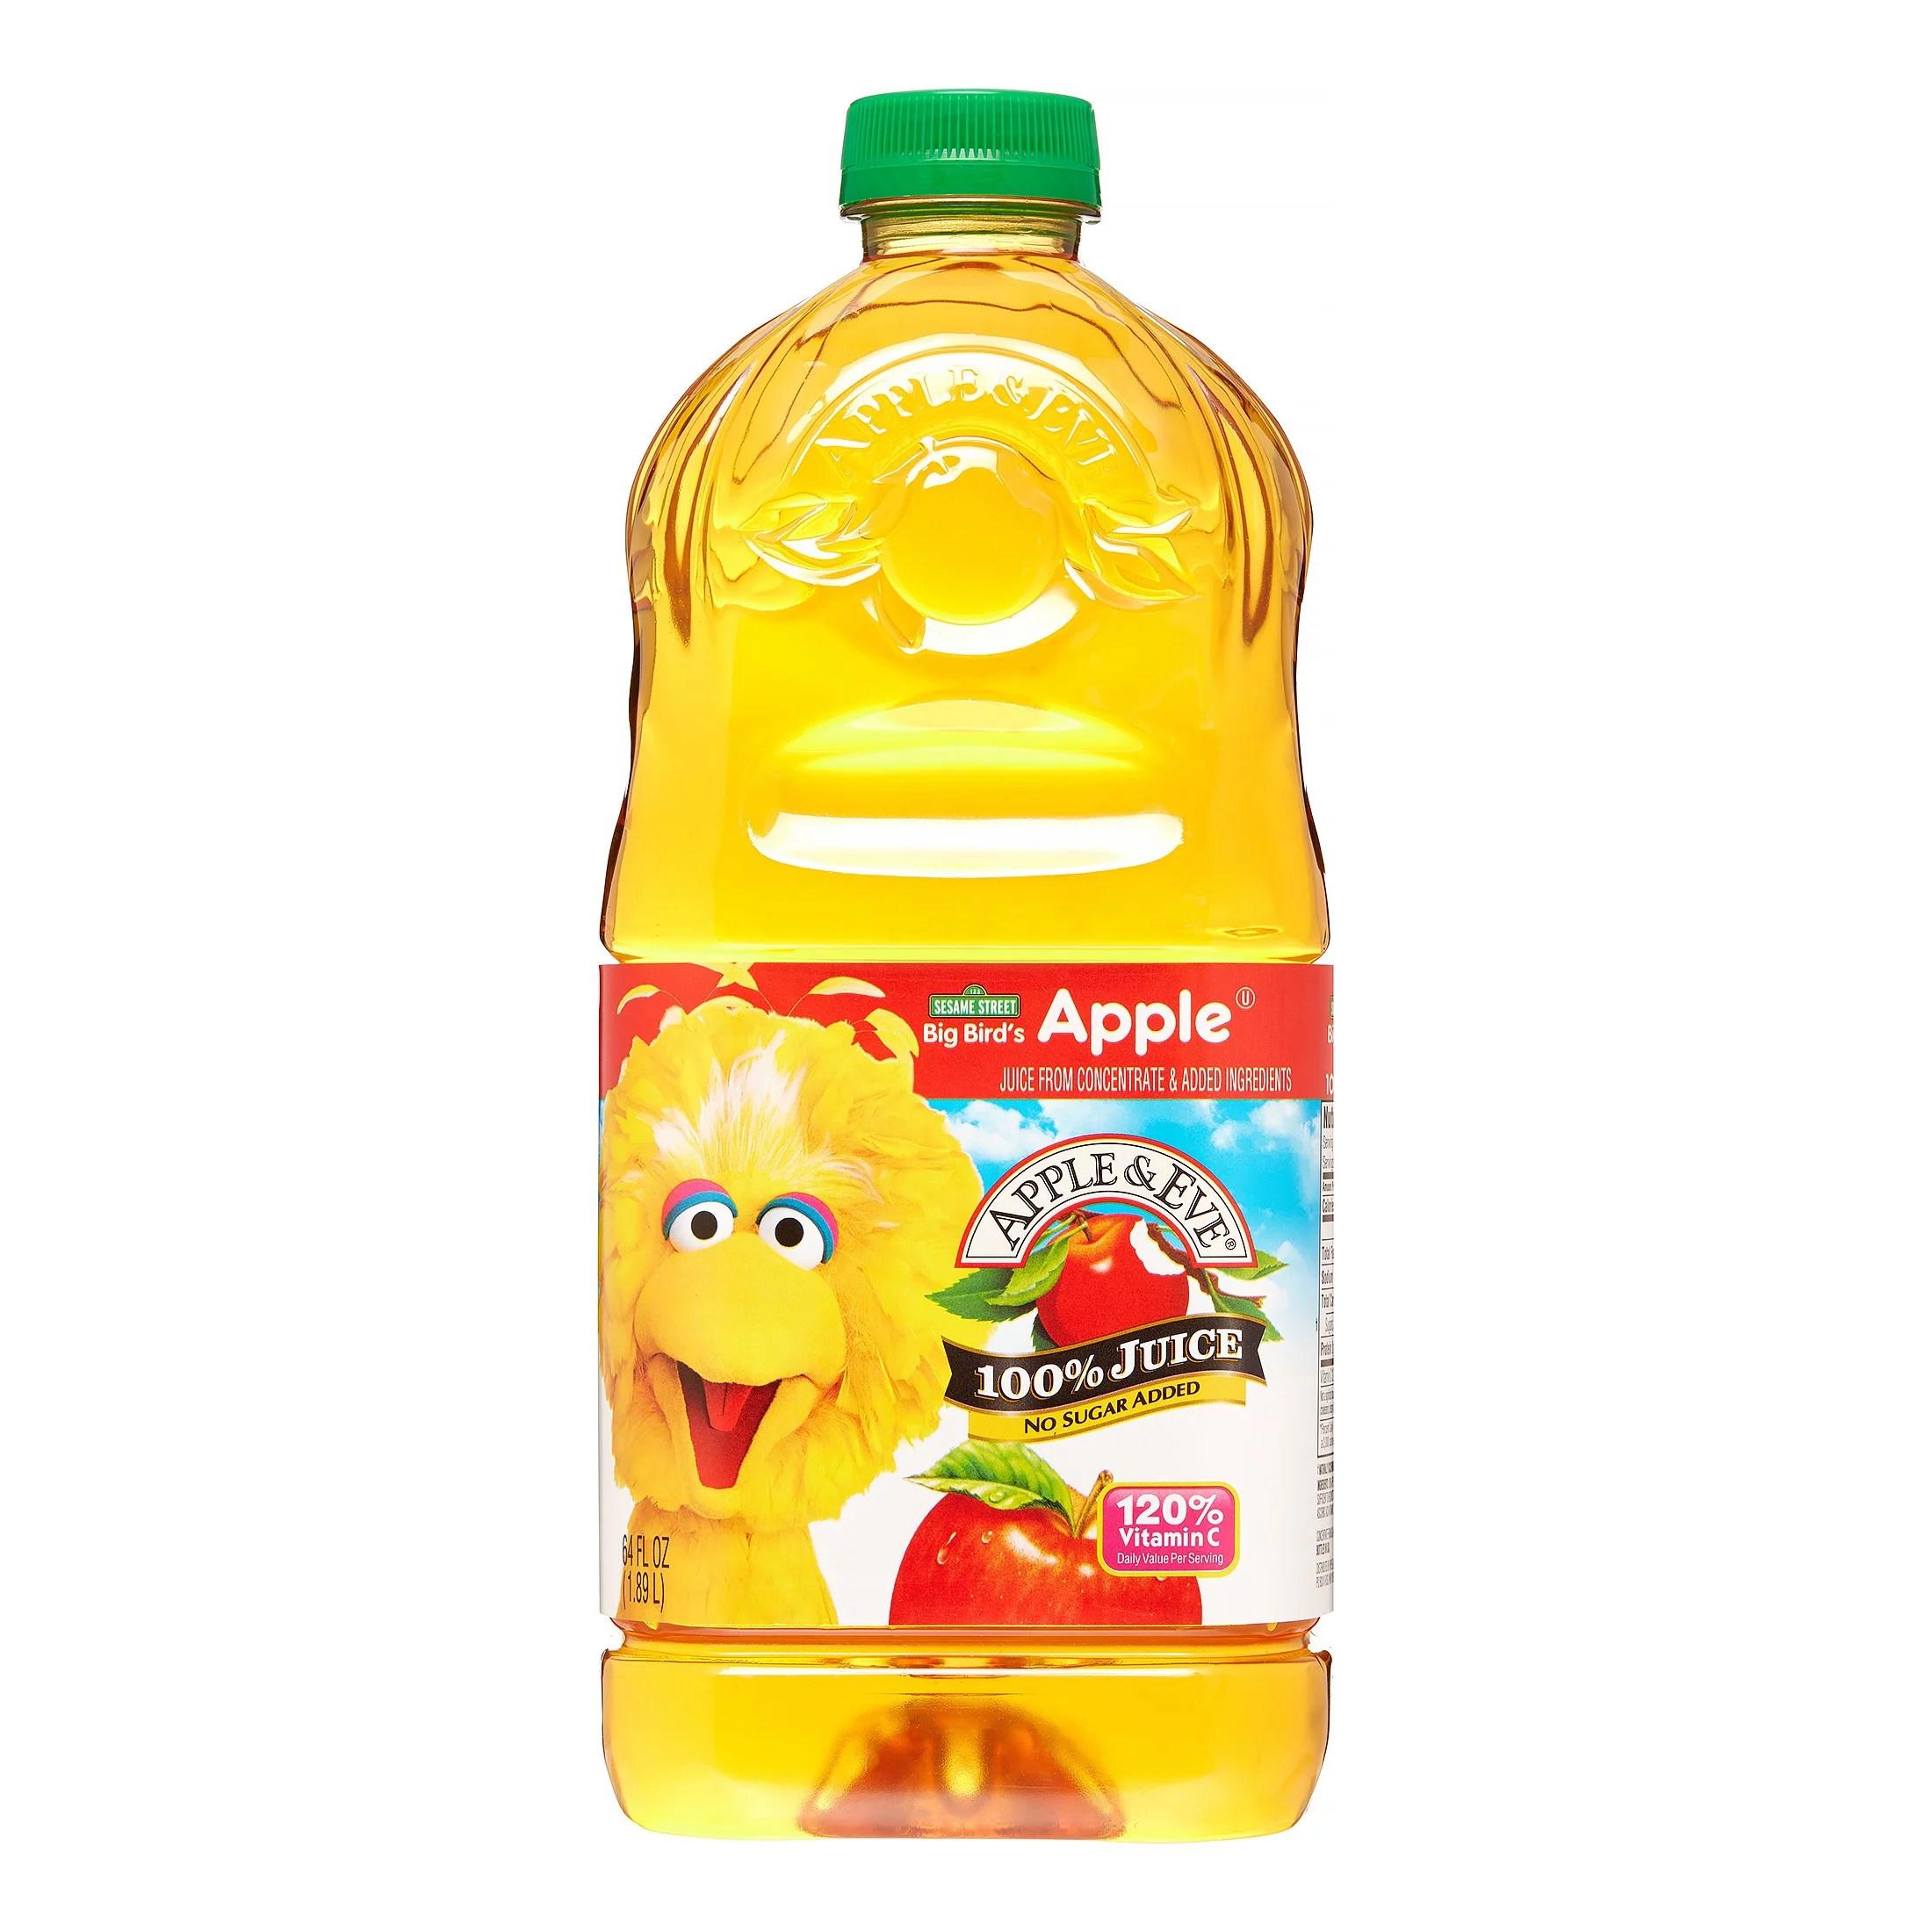 Apple Eve 100 Juice Sesame Street Big Bird Apple 64